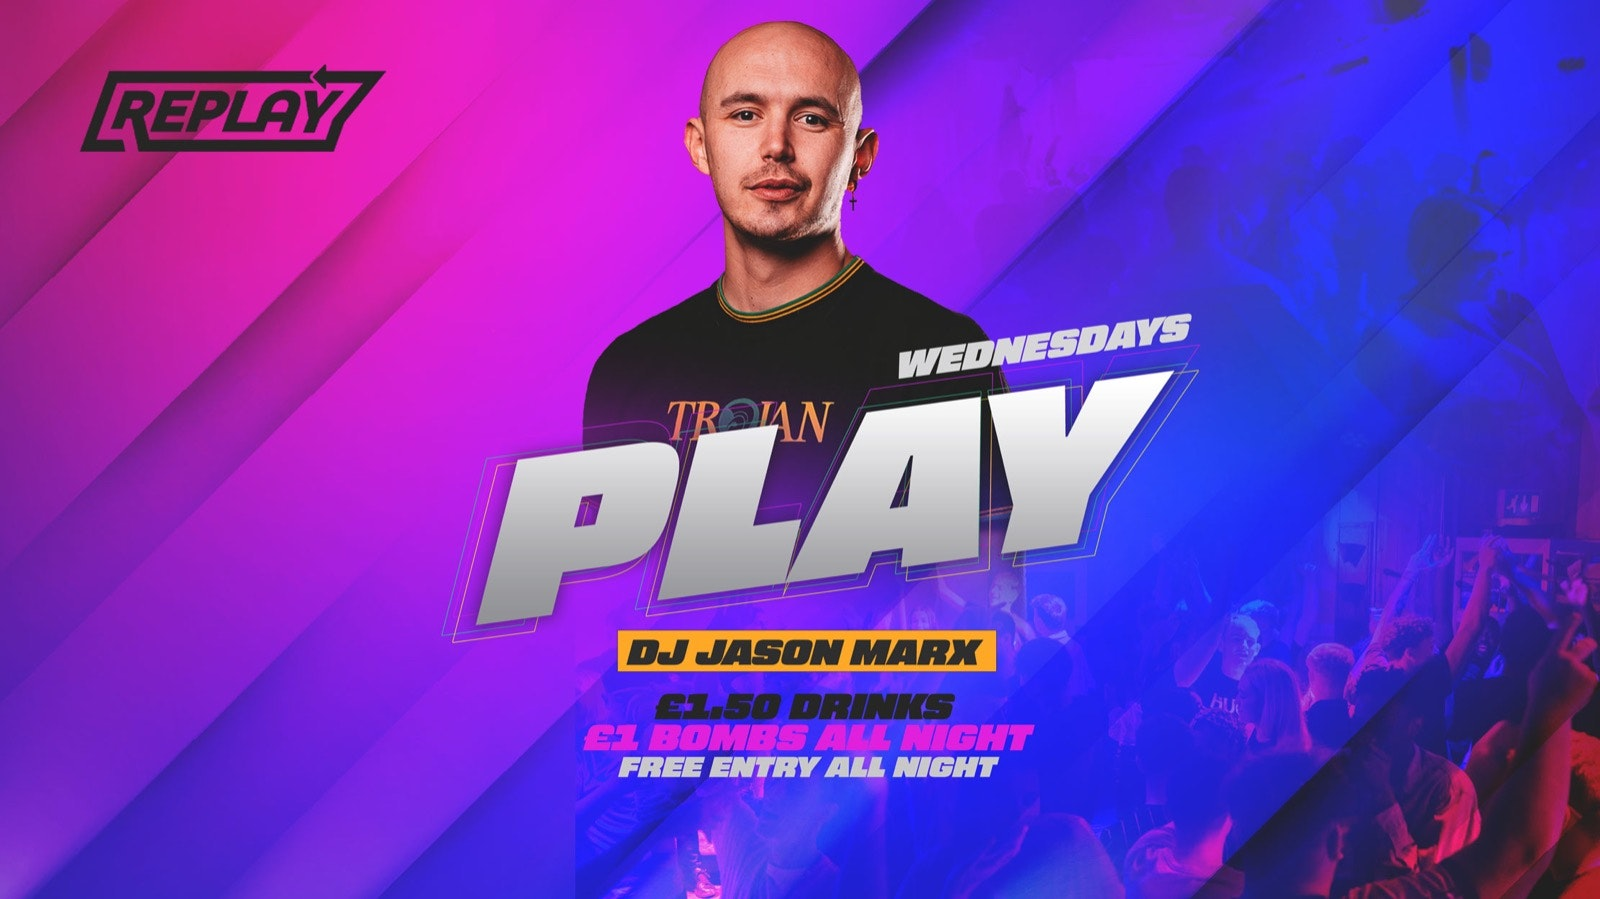 Disco Bingo + Play Wednesdays At Replay